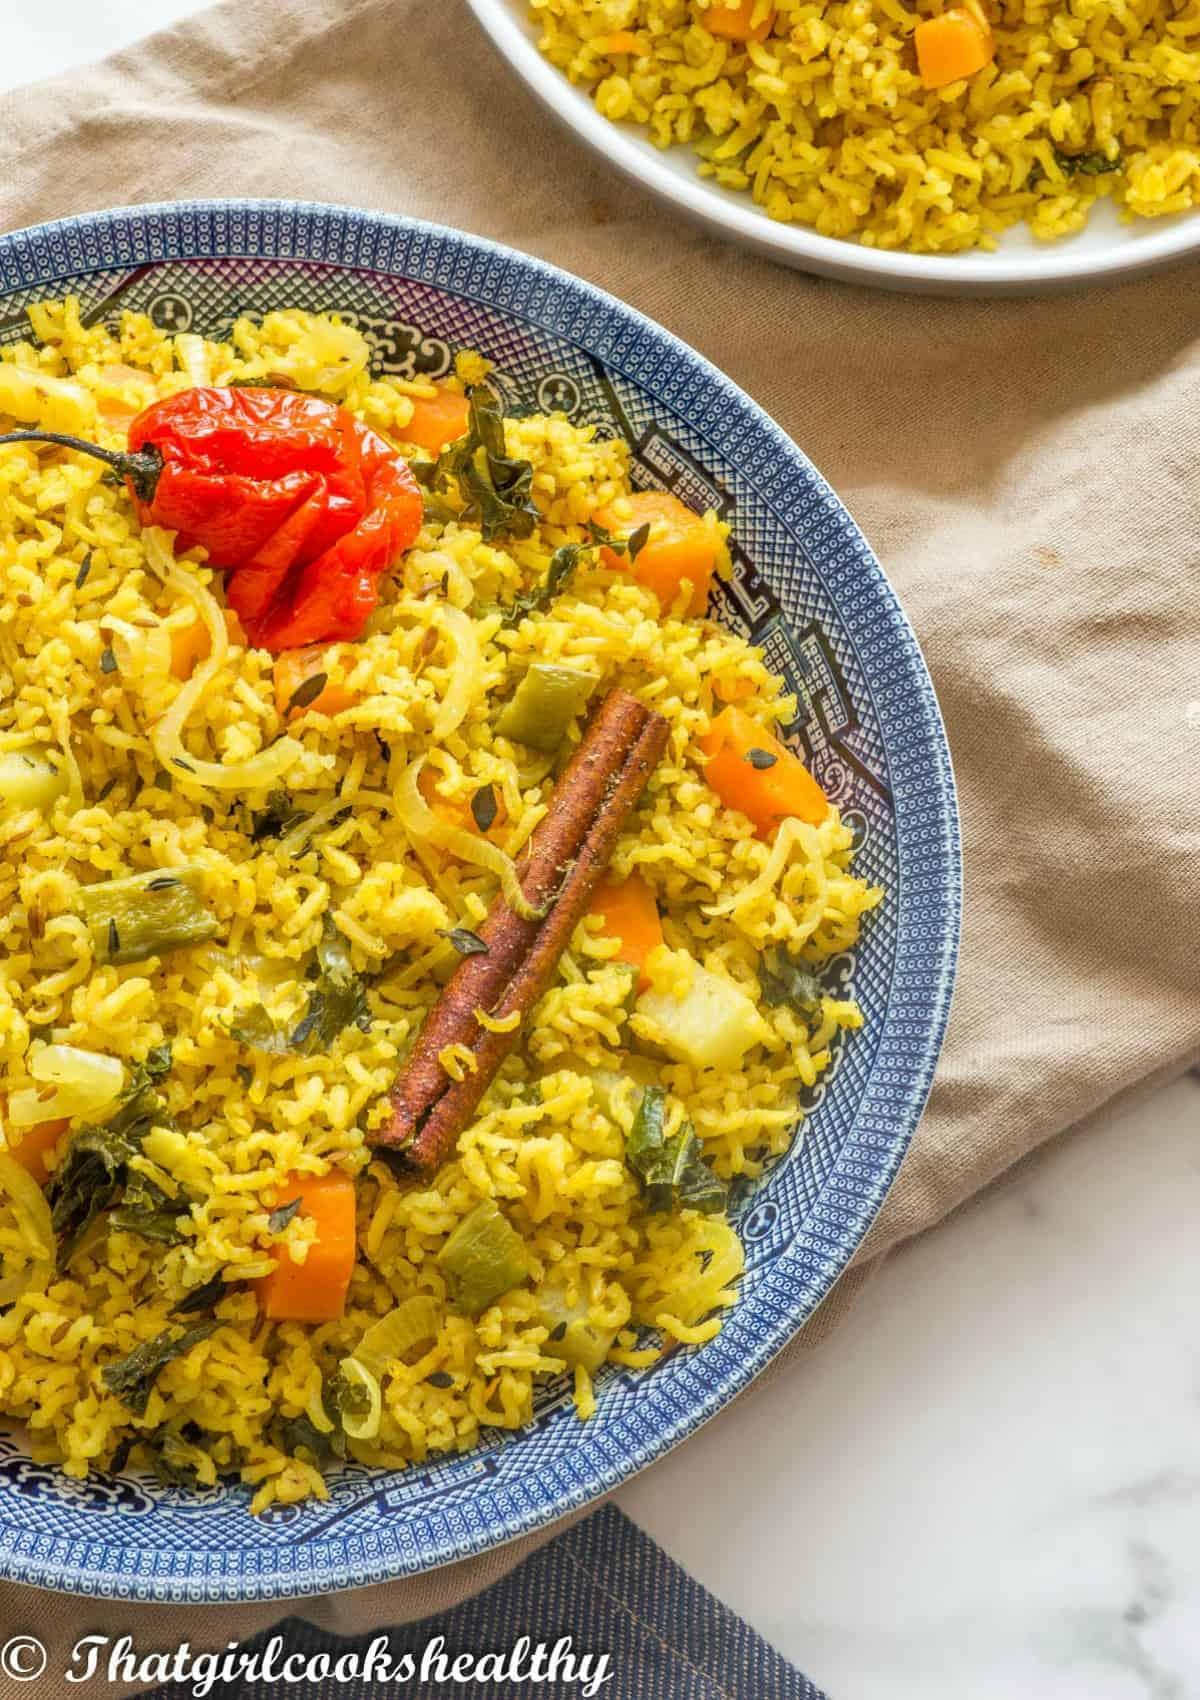 Half a bowl of rice